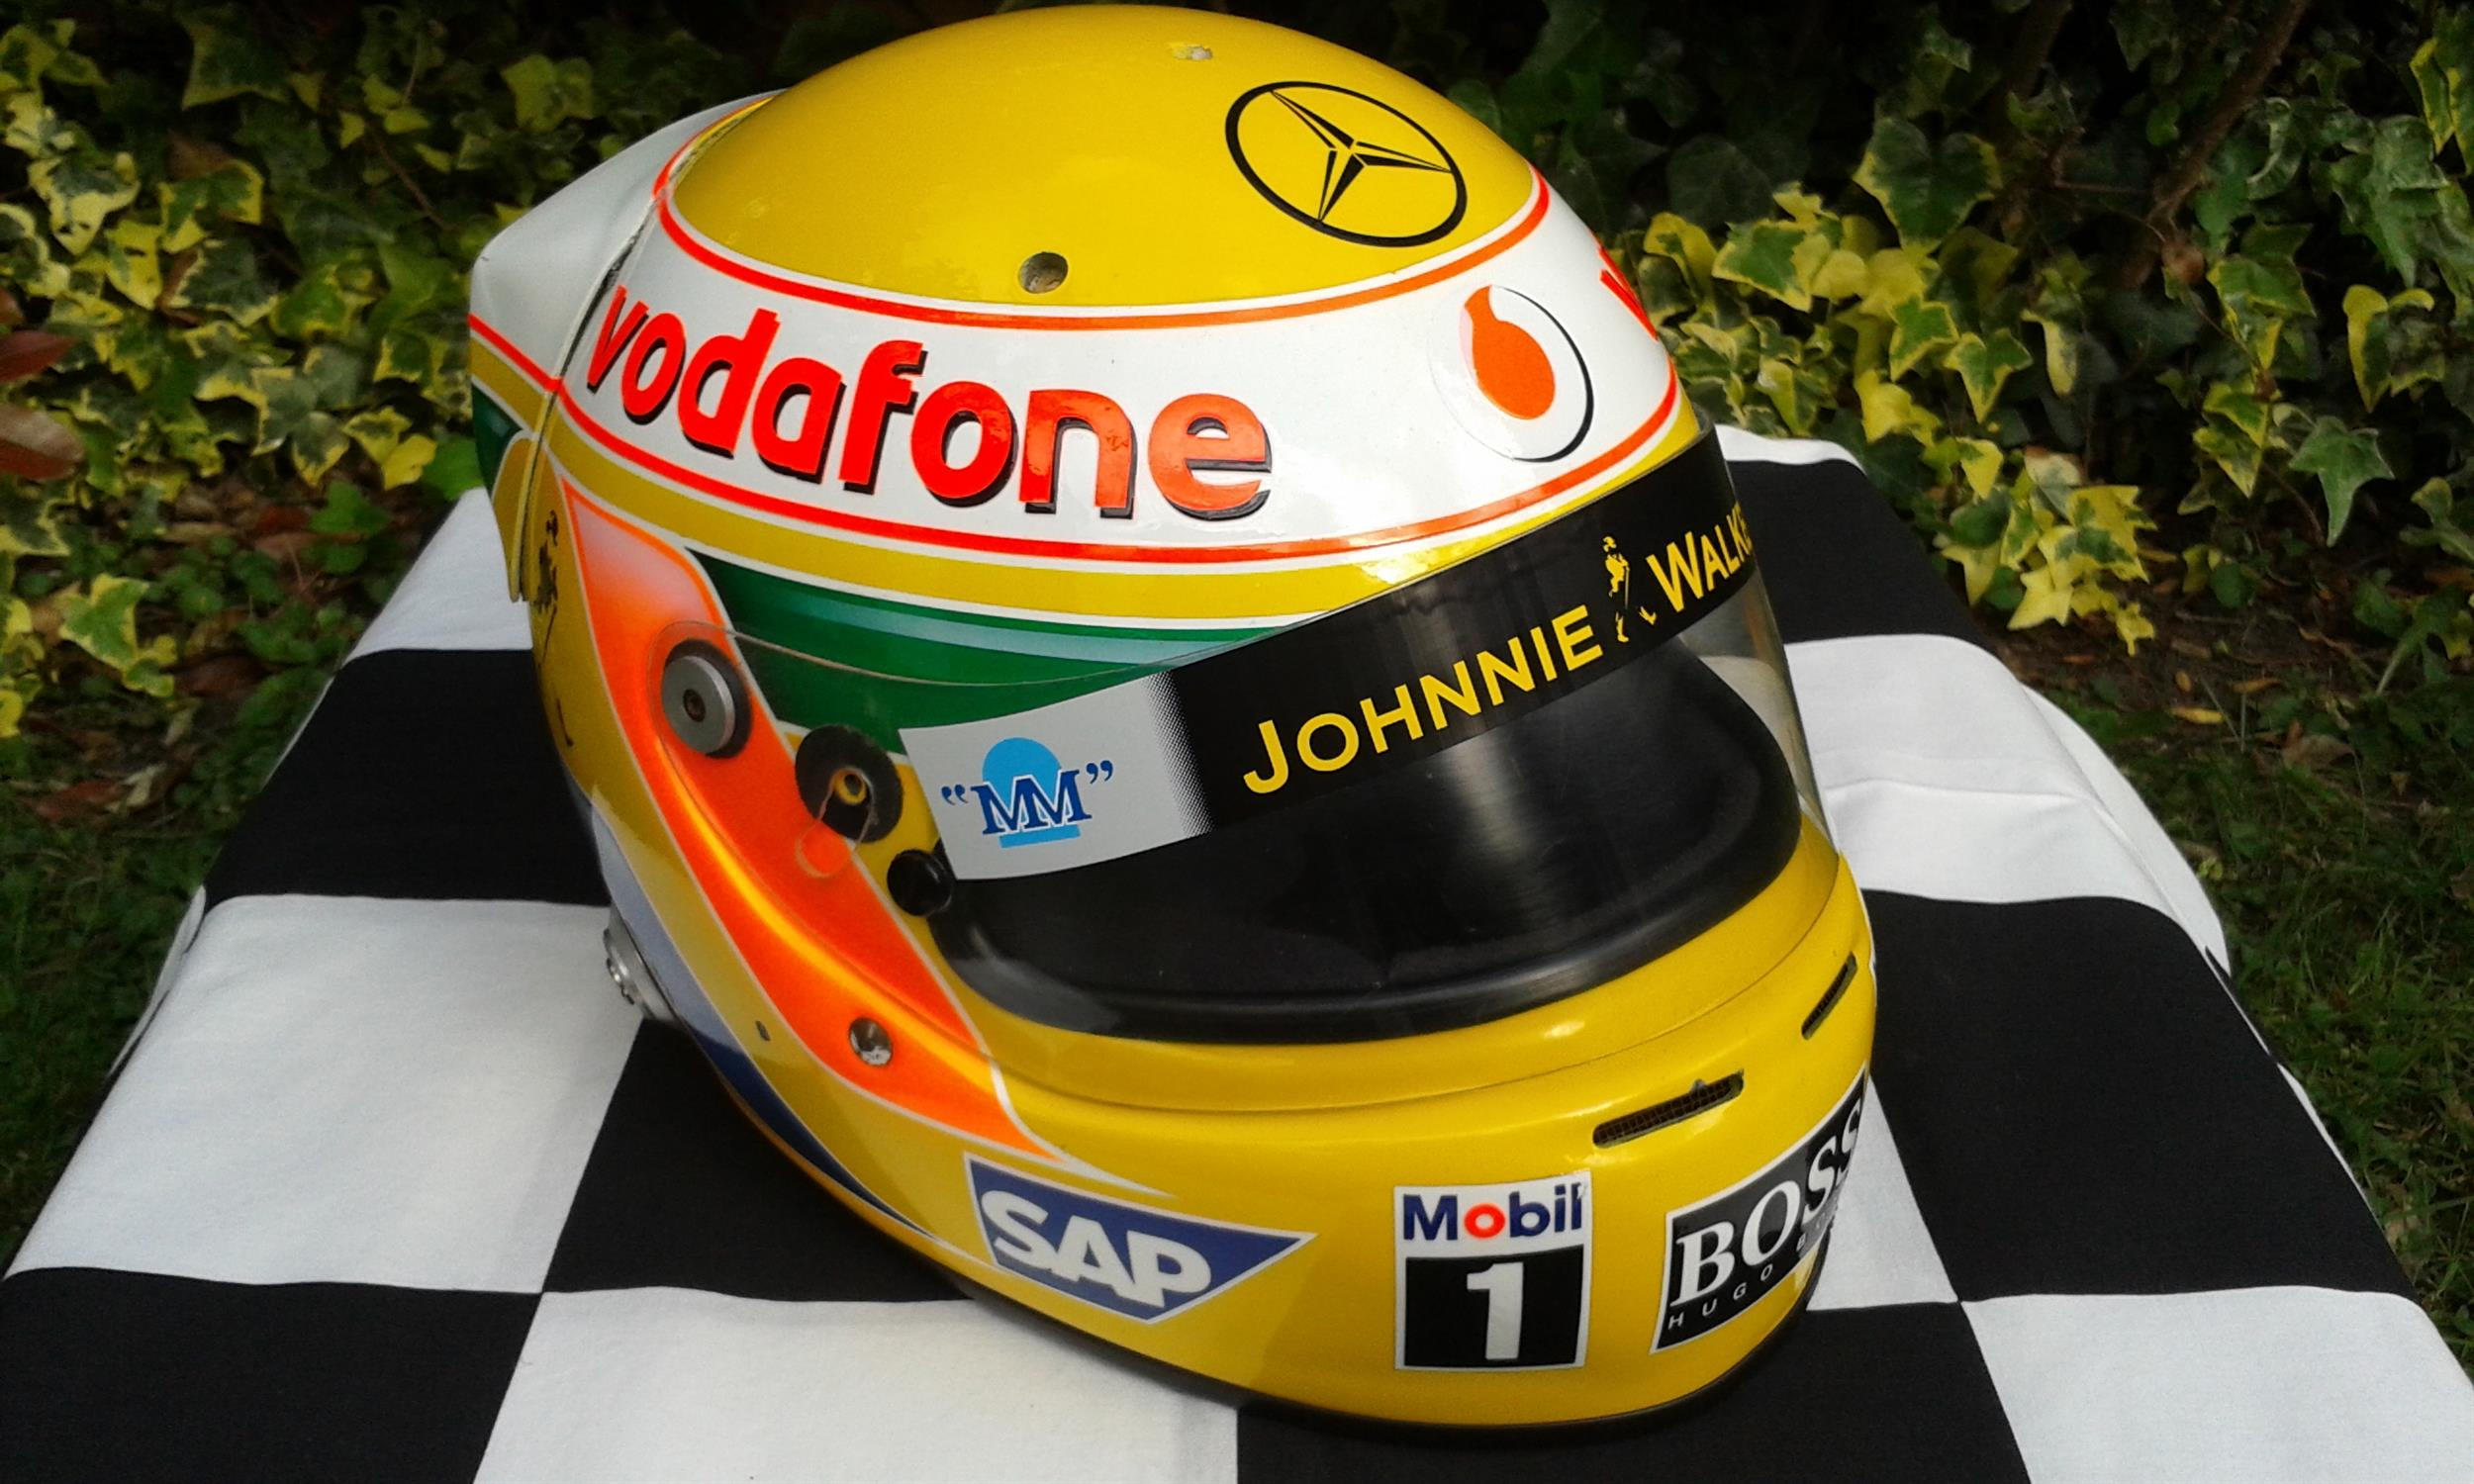 Lewis Hamilton 2008 World Championship winning Year Replica Helmet - Image 3 of 3